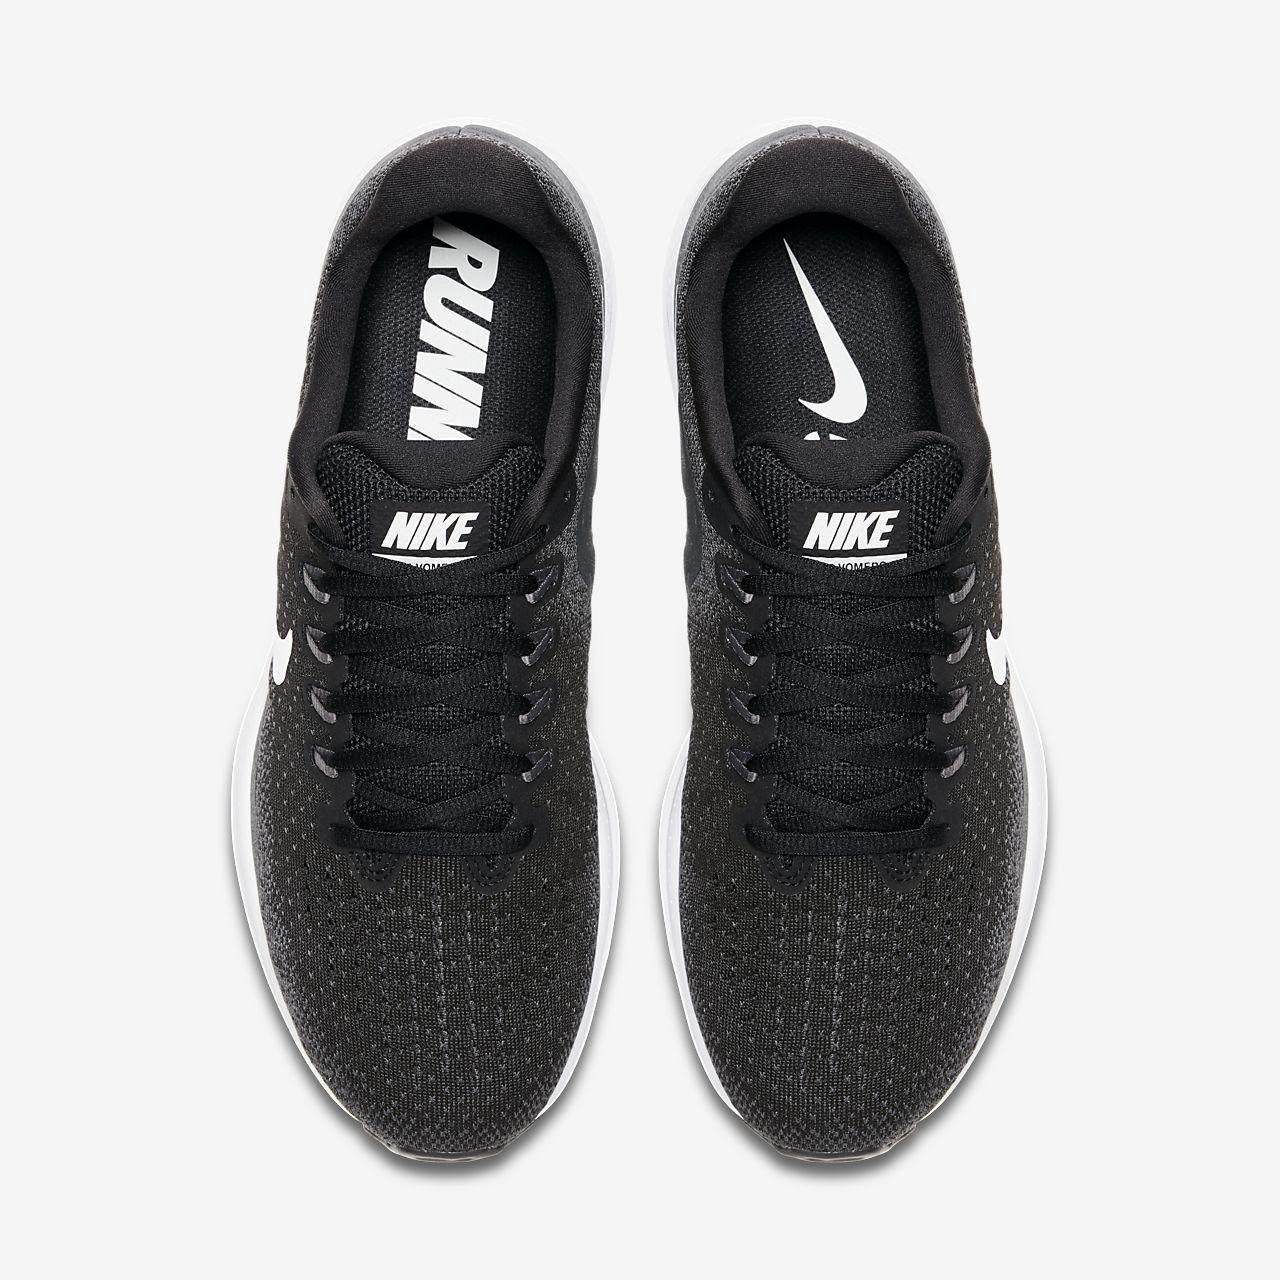 632076fc30151 Nike Air Zoom Vomero 13 Men s Running Shoe - 11.5 Grey